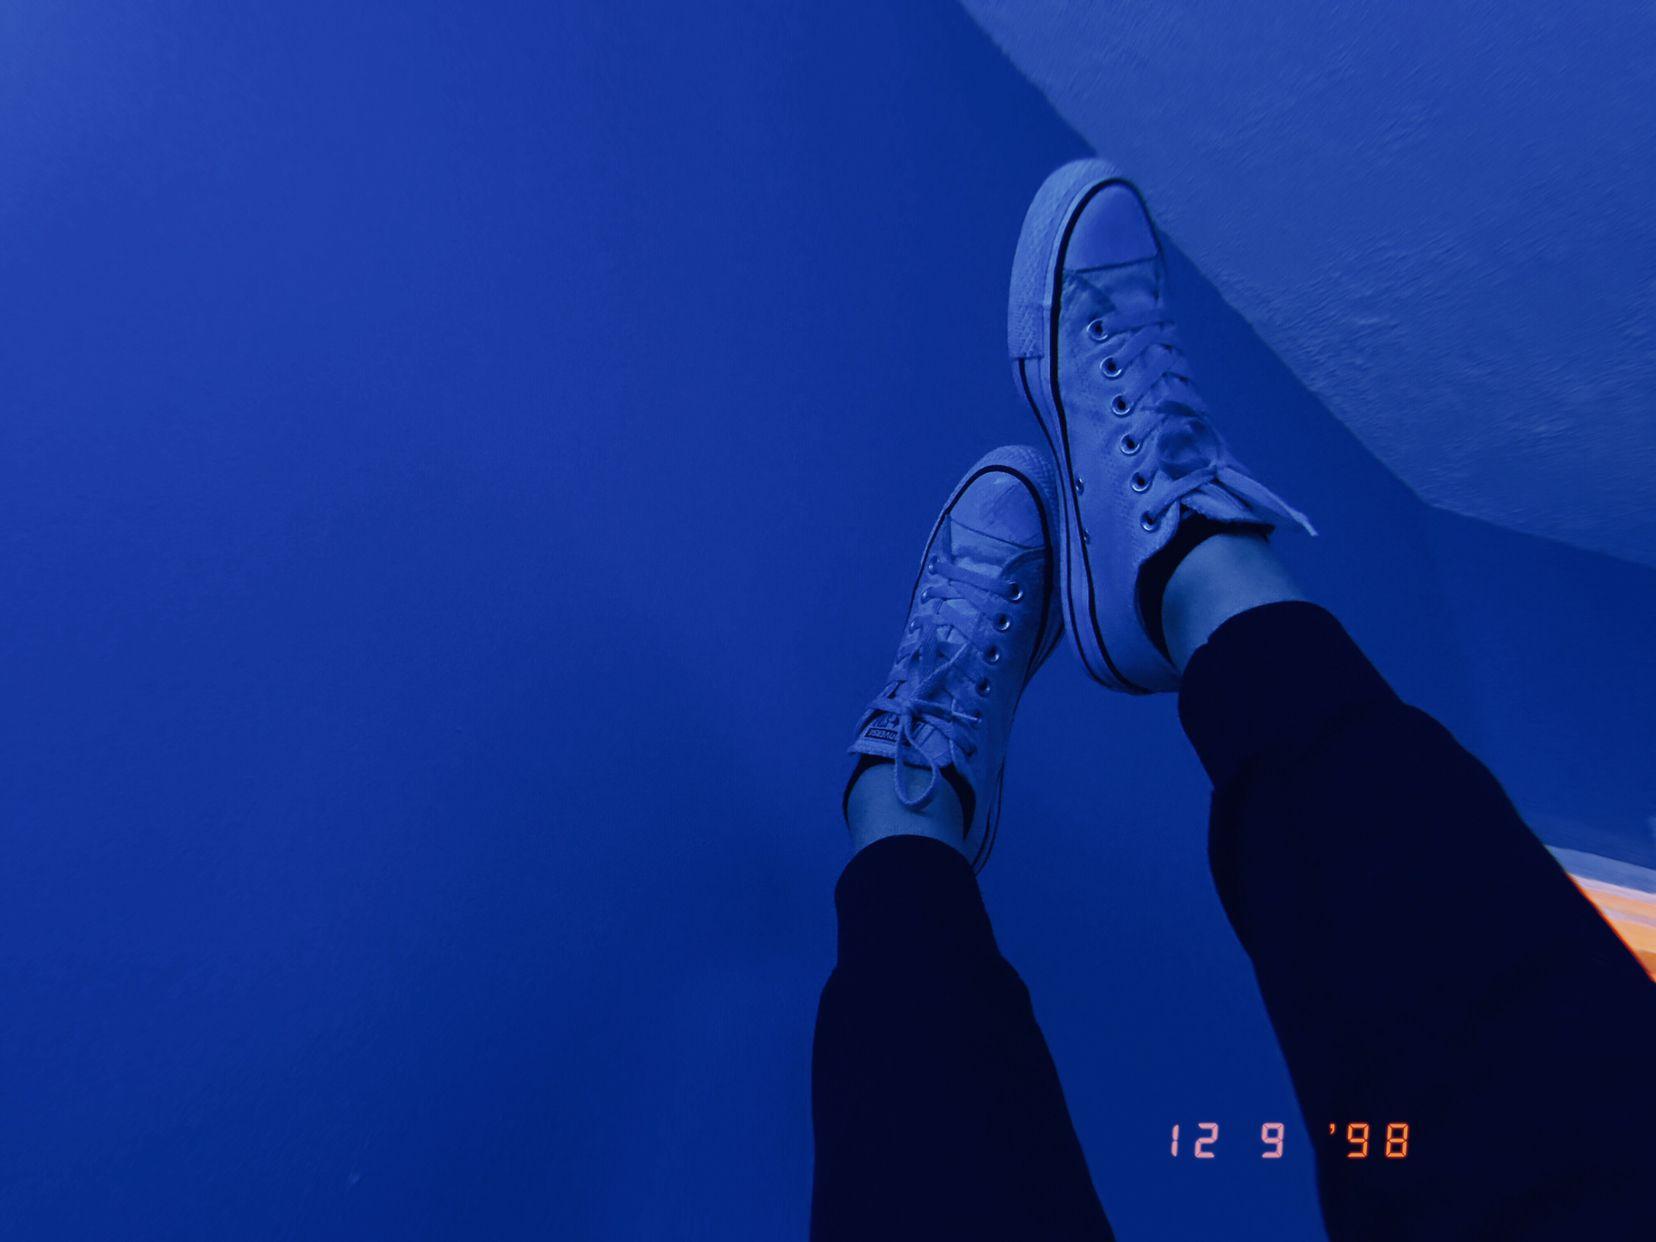 ???? #blueaesthetic